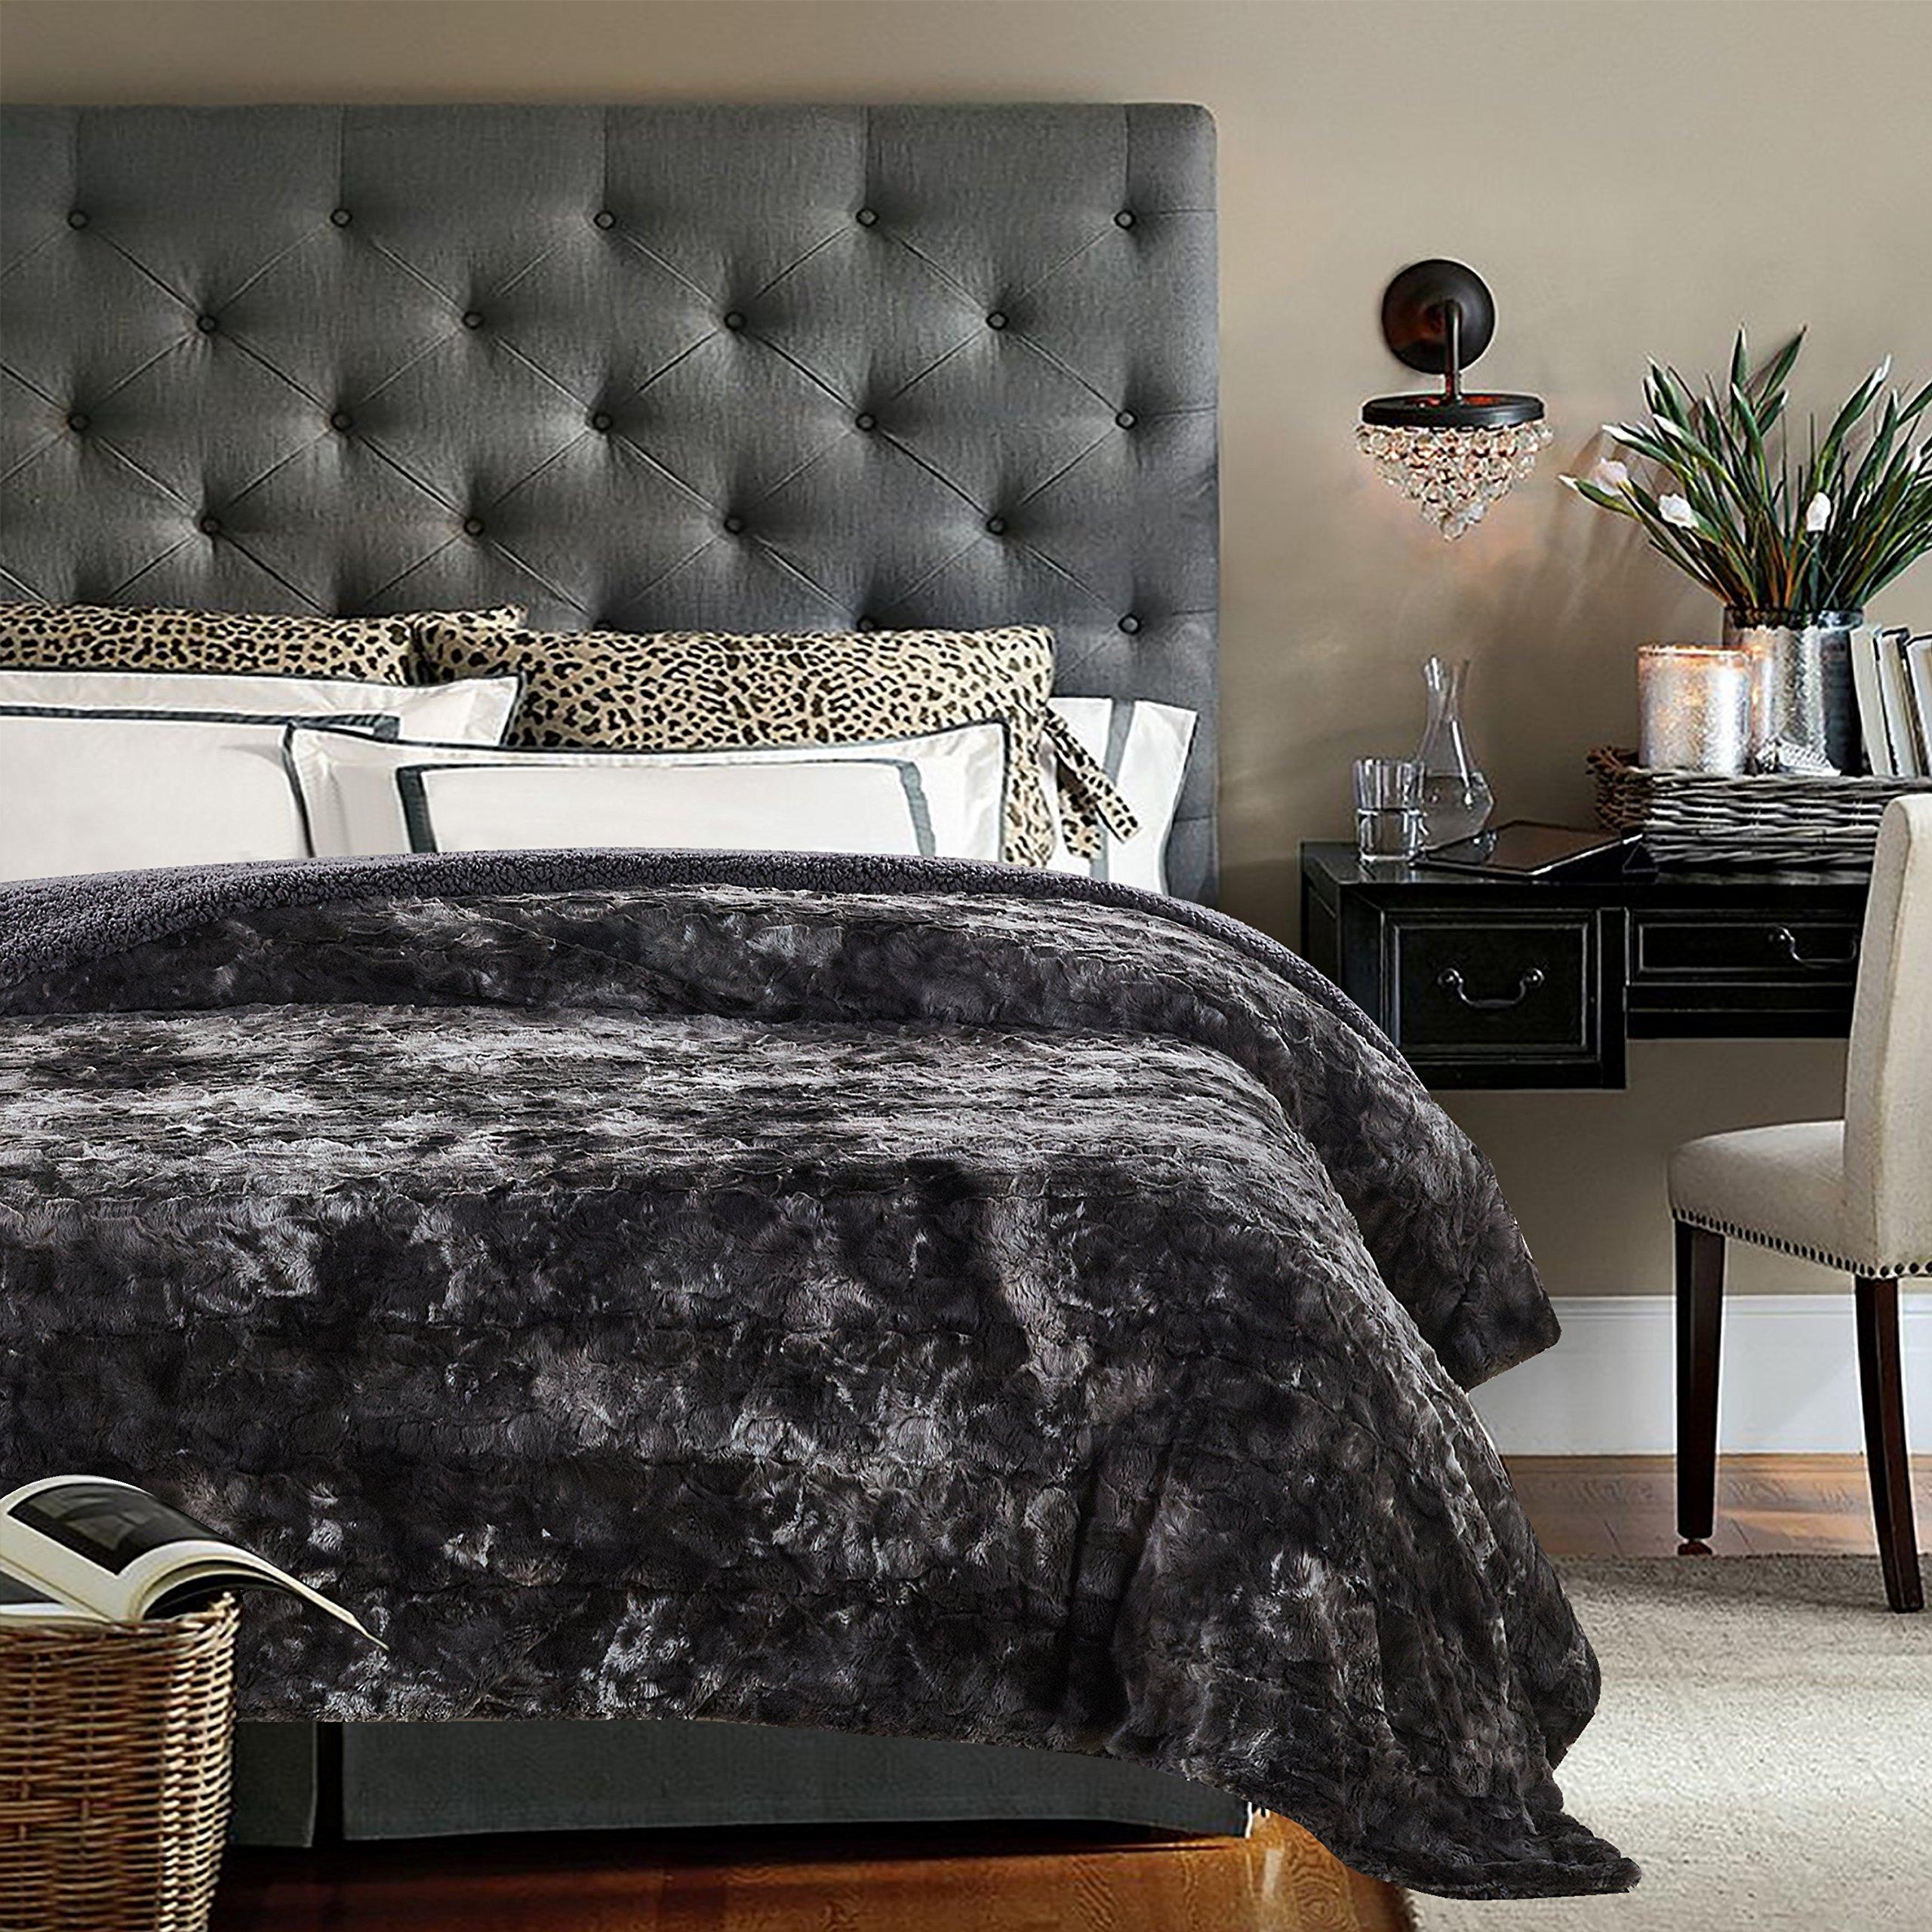 Chanasya Faux Fur Bed Throw Blanket - Super Soft Fuzzy Cozy Warm Fluffy Beautiful Color Variation Print Plush Sherpa Microfiber Gray Blanket (86''x108'') KING by Chanasya